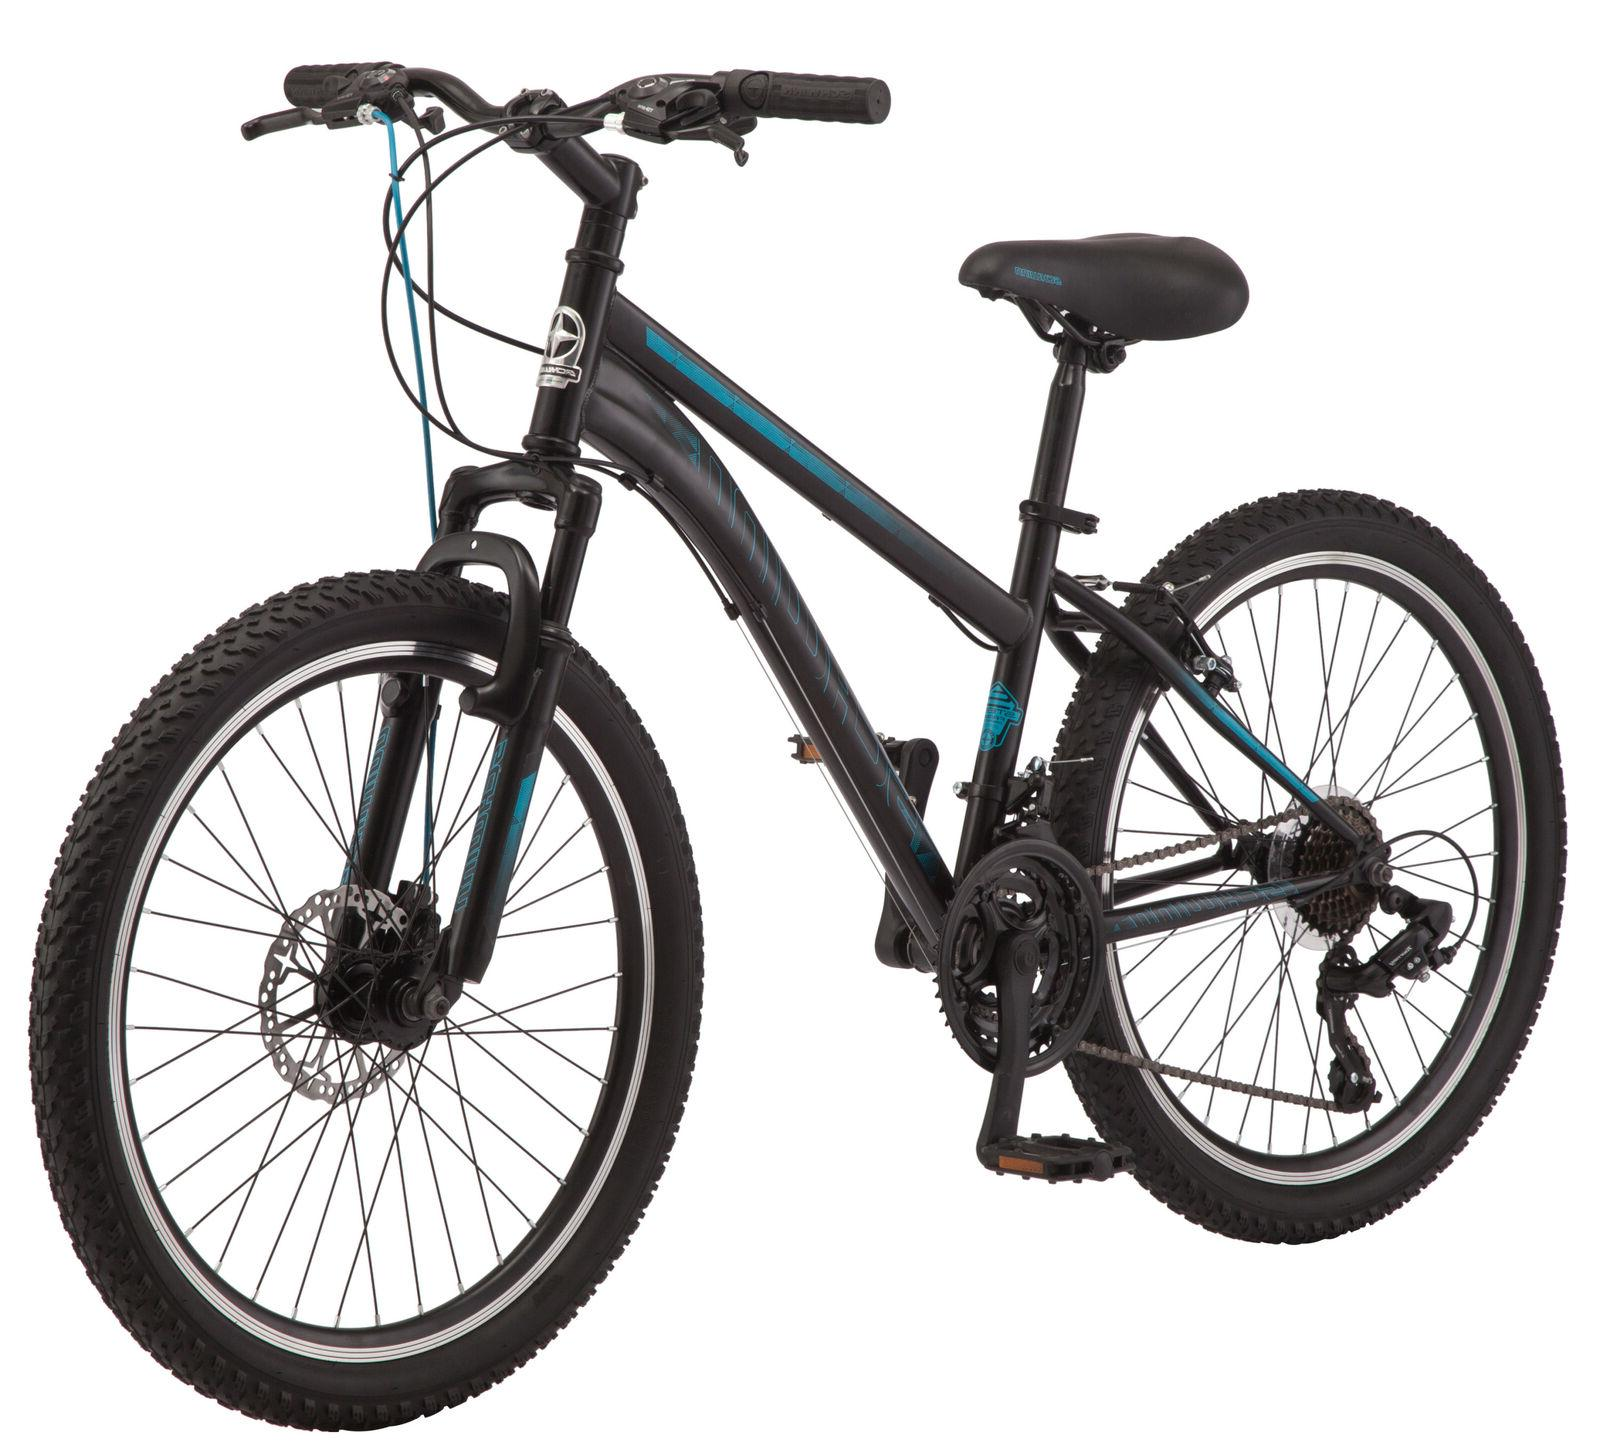 sidewinder mountain bike 24 inch wheel 21